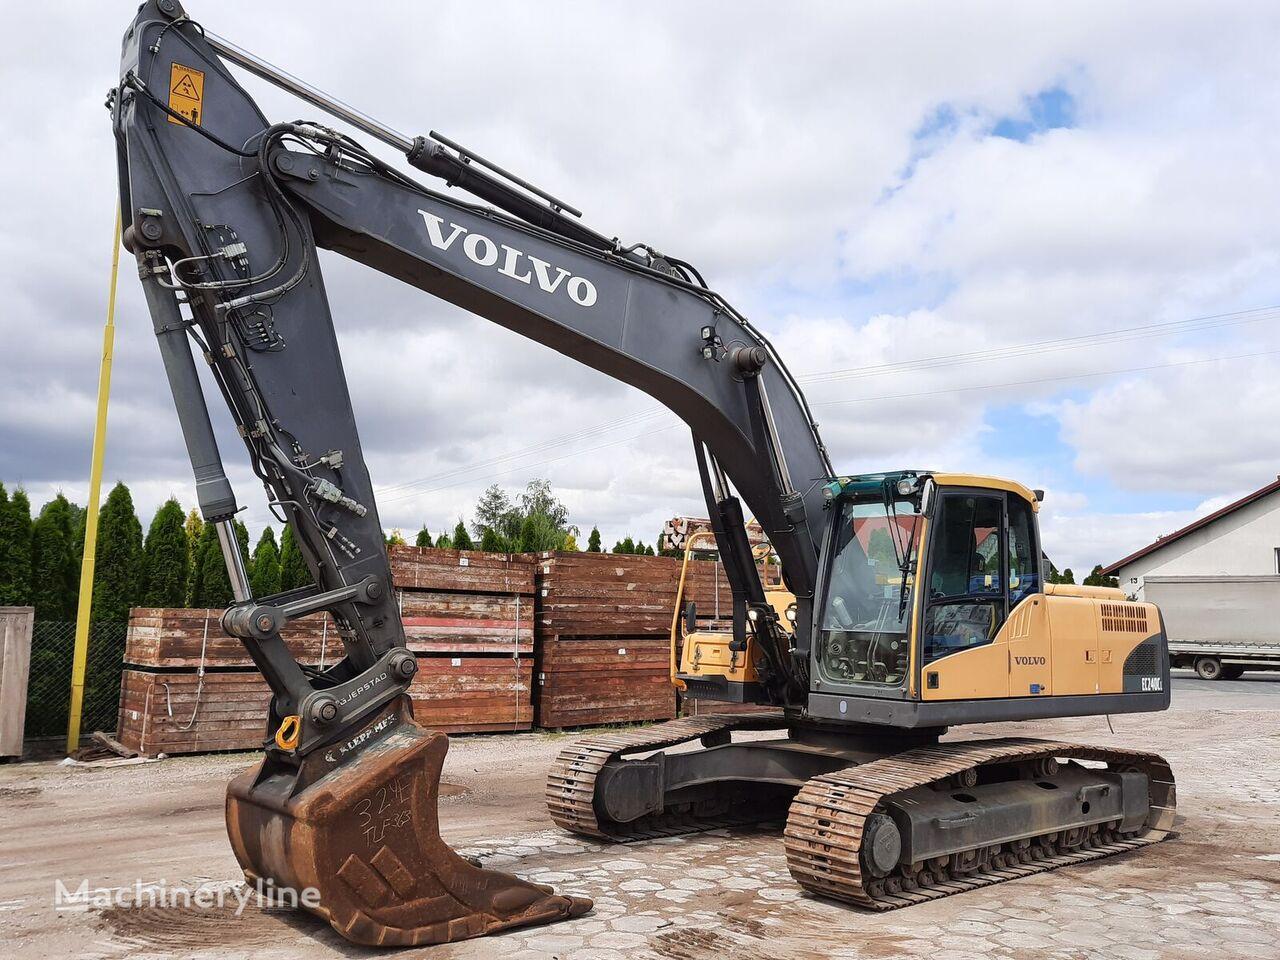 VOLVO-ABG EC 240 CL tracked excavator